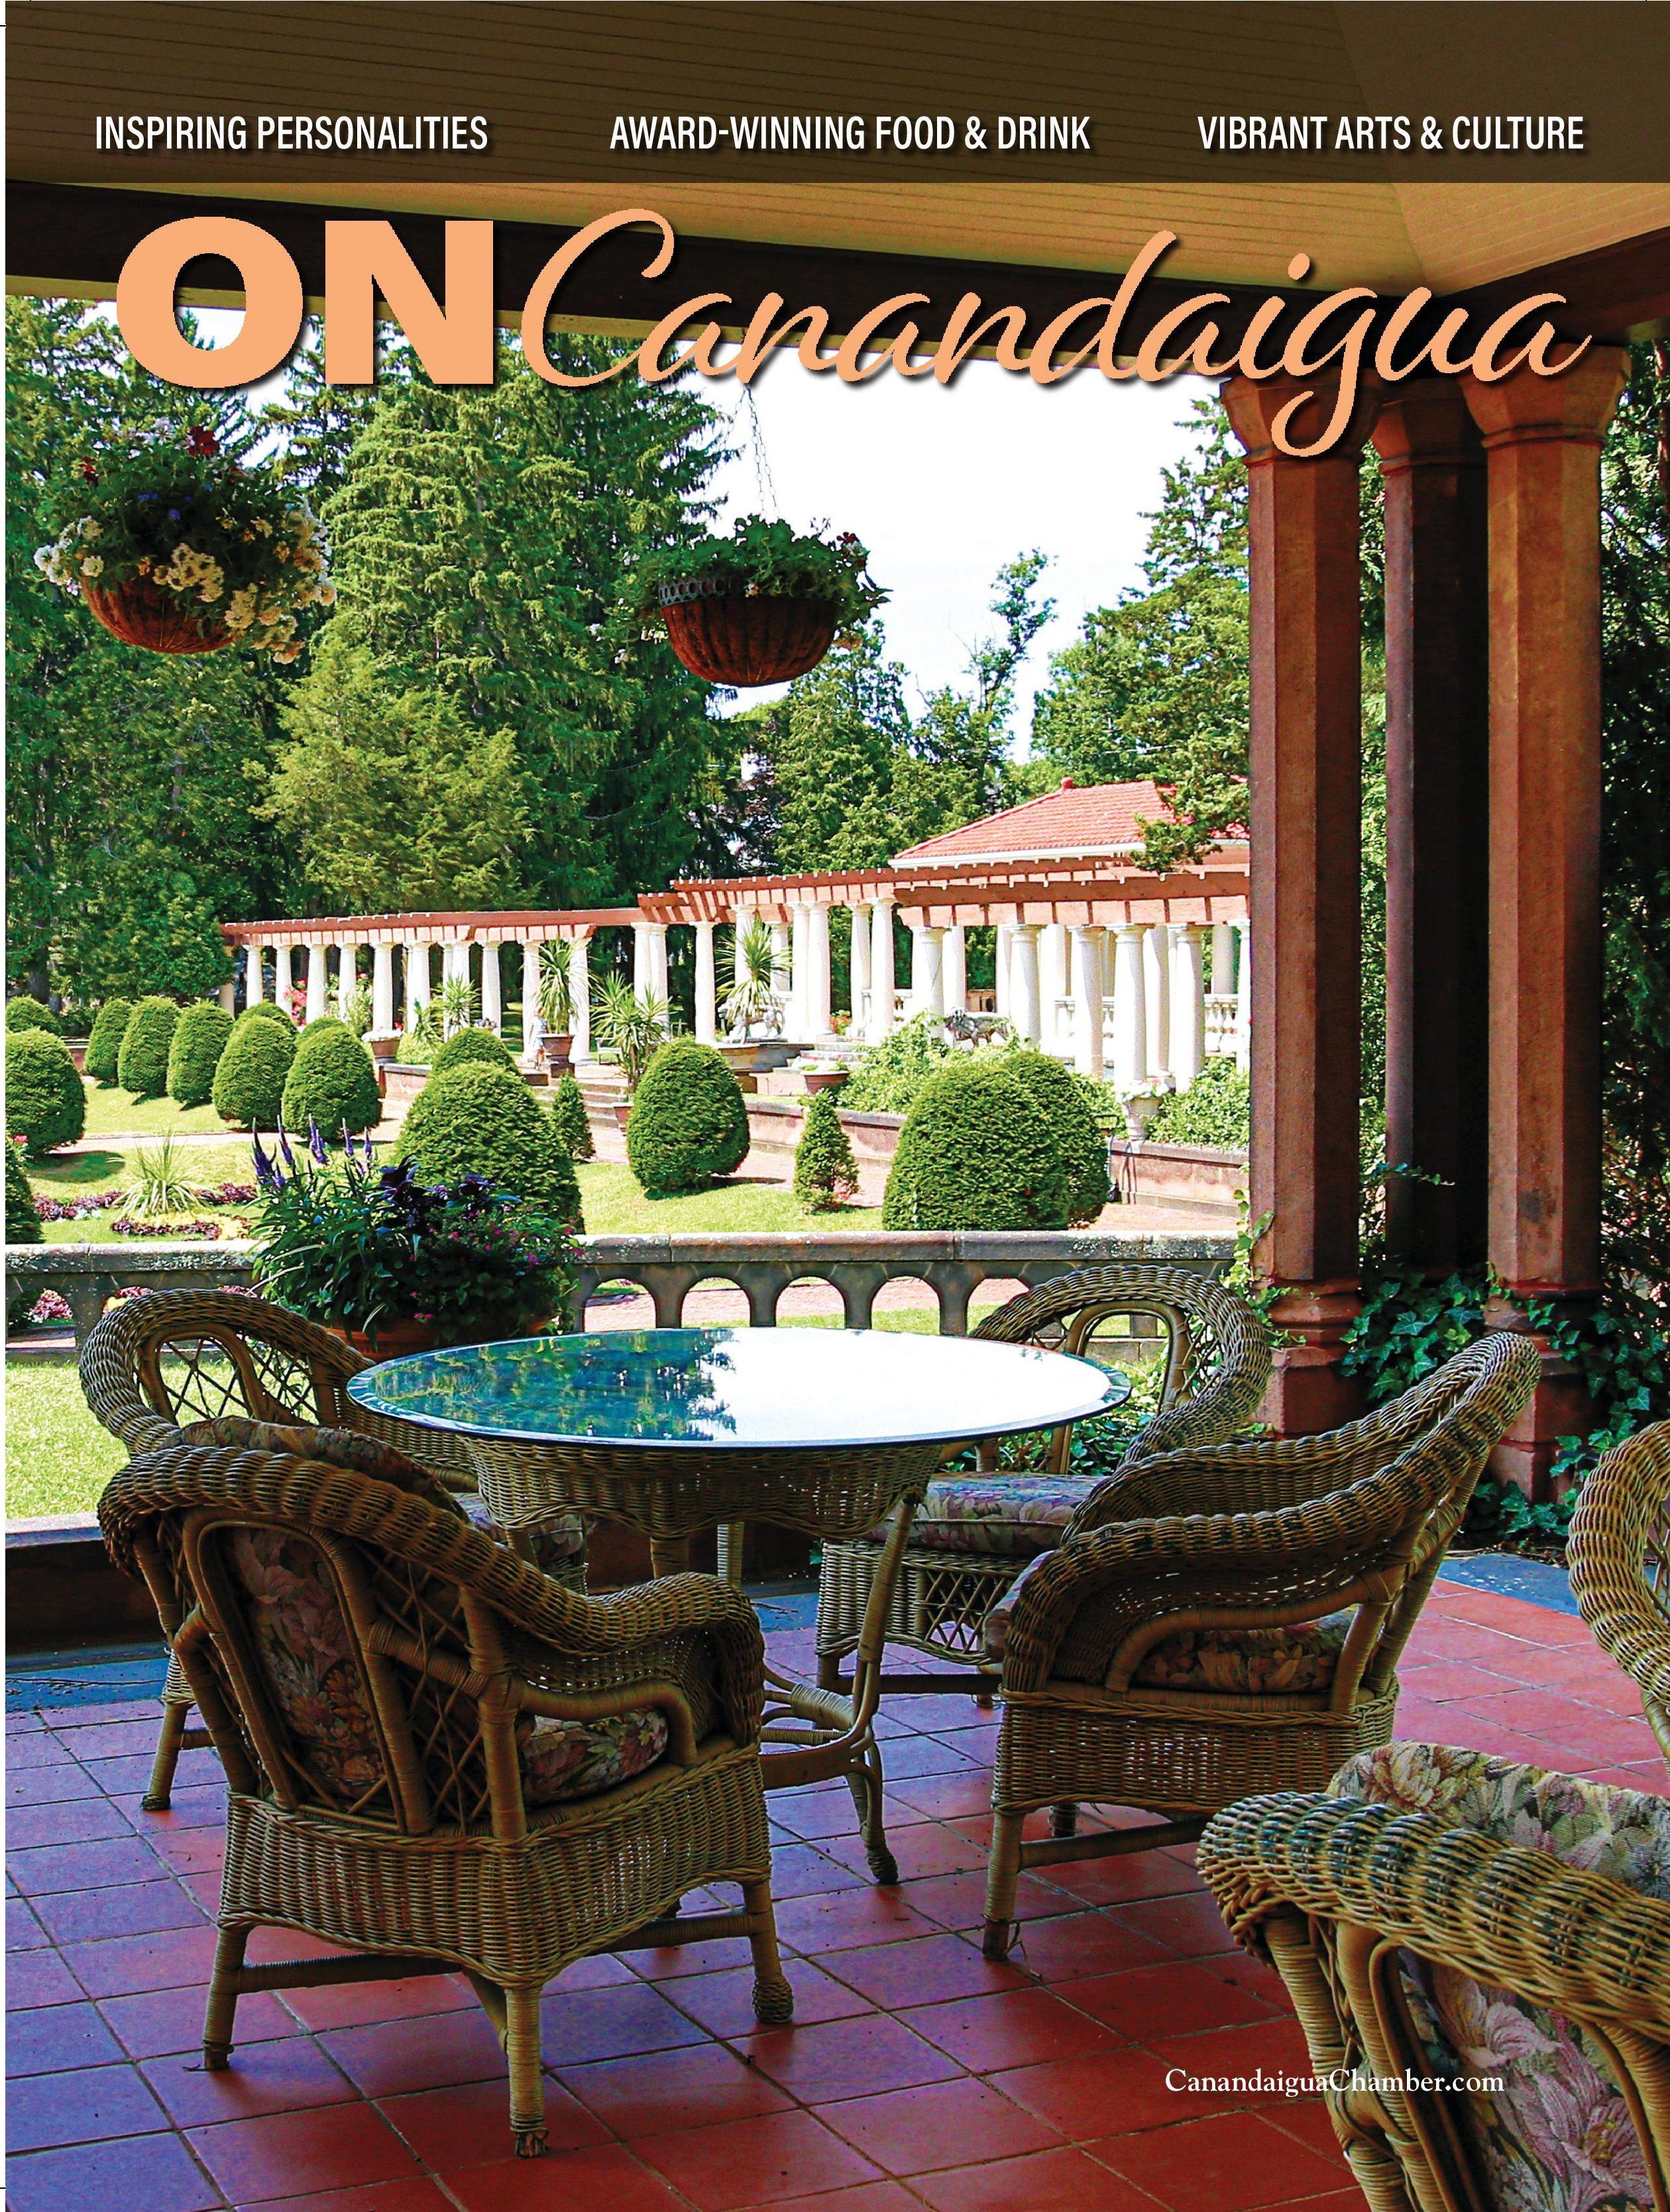 001_ONCanandaigua 2021-page-001